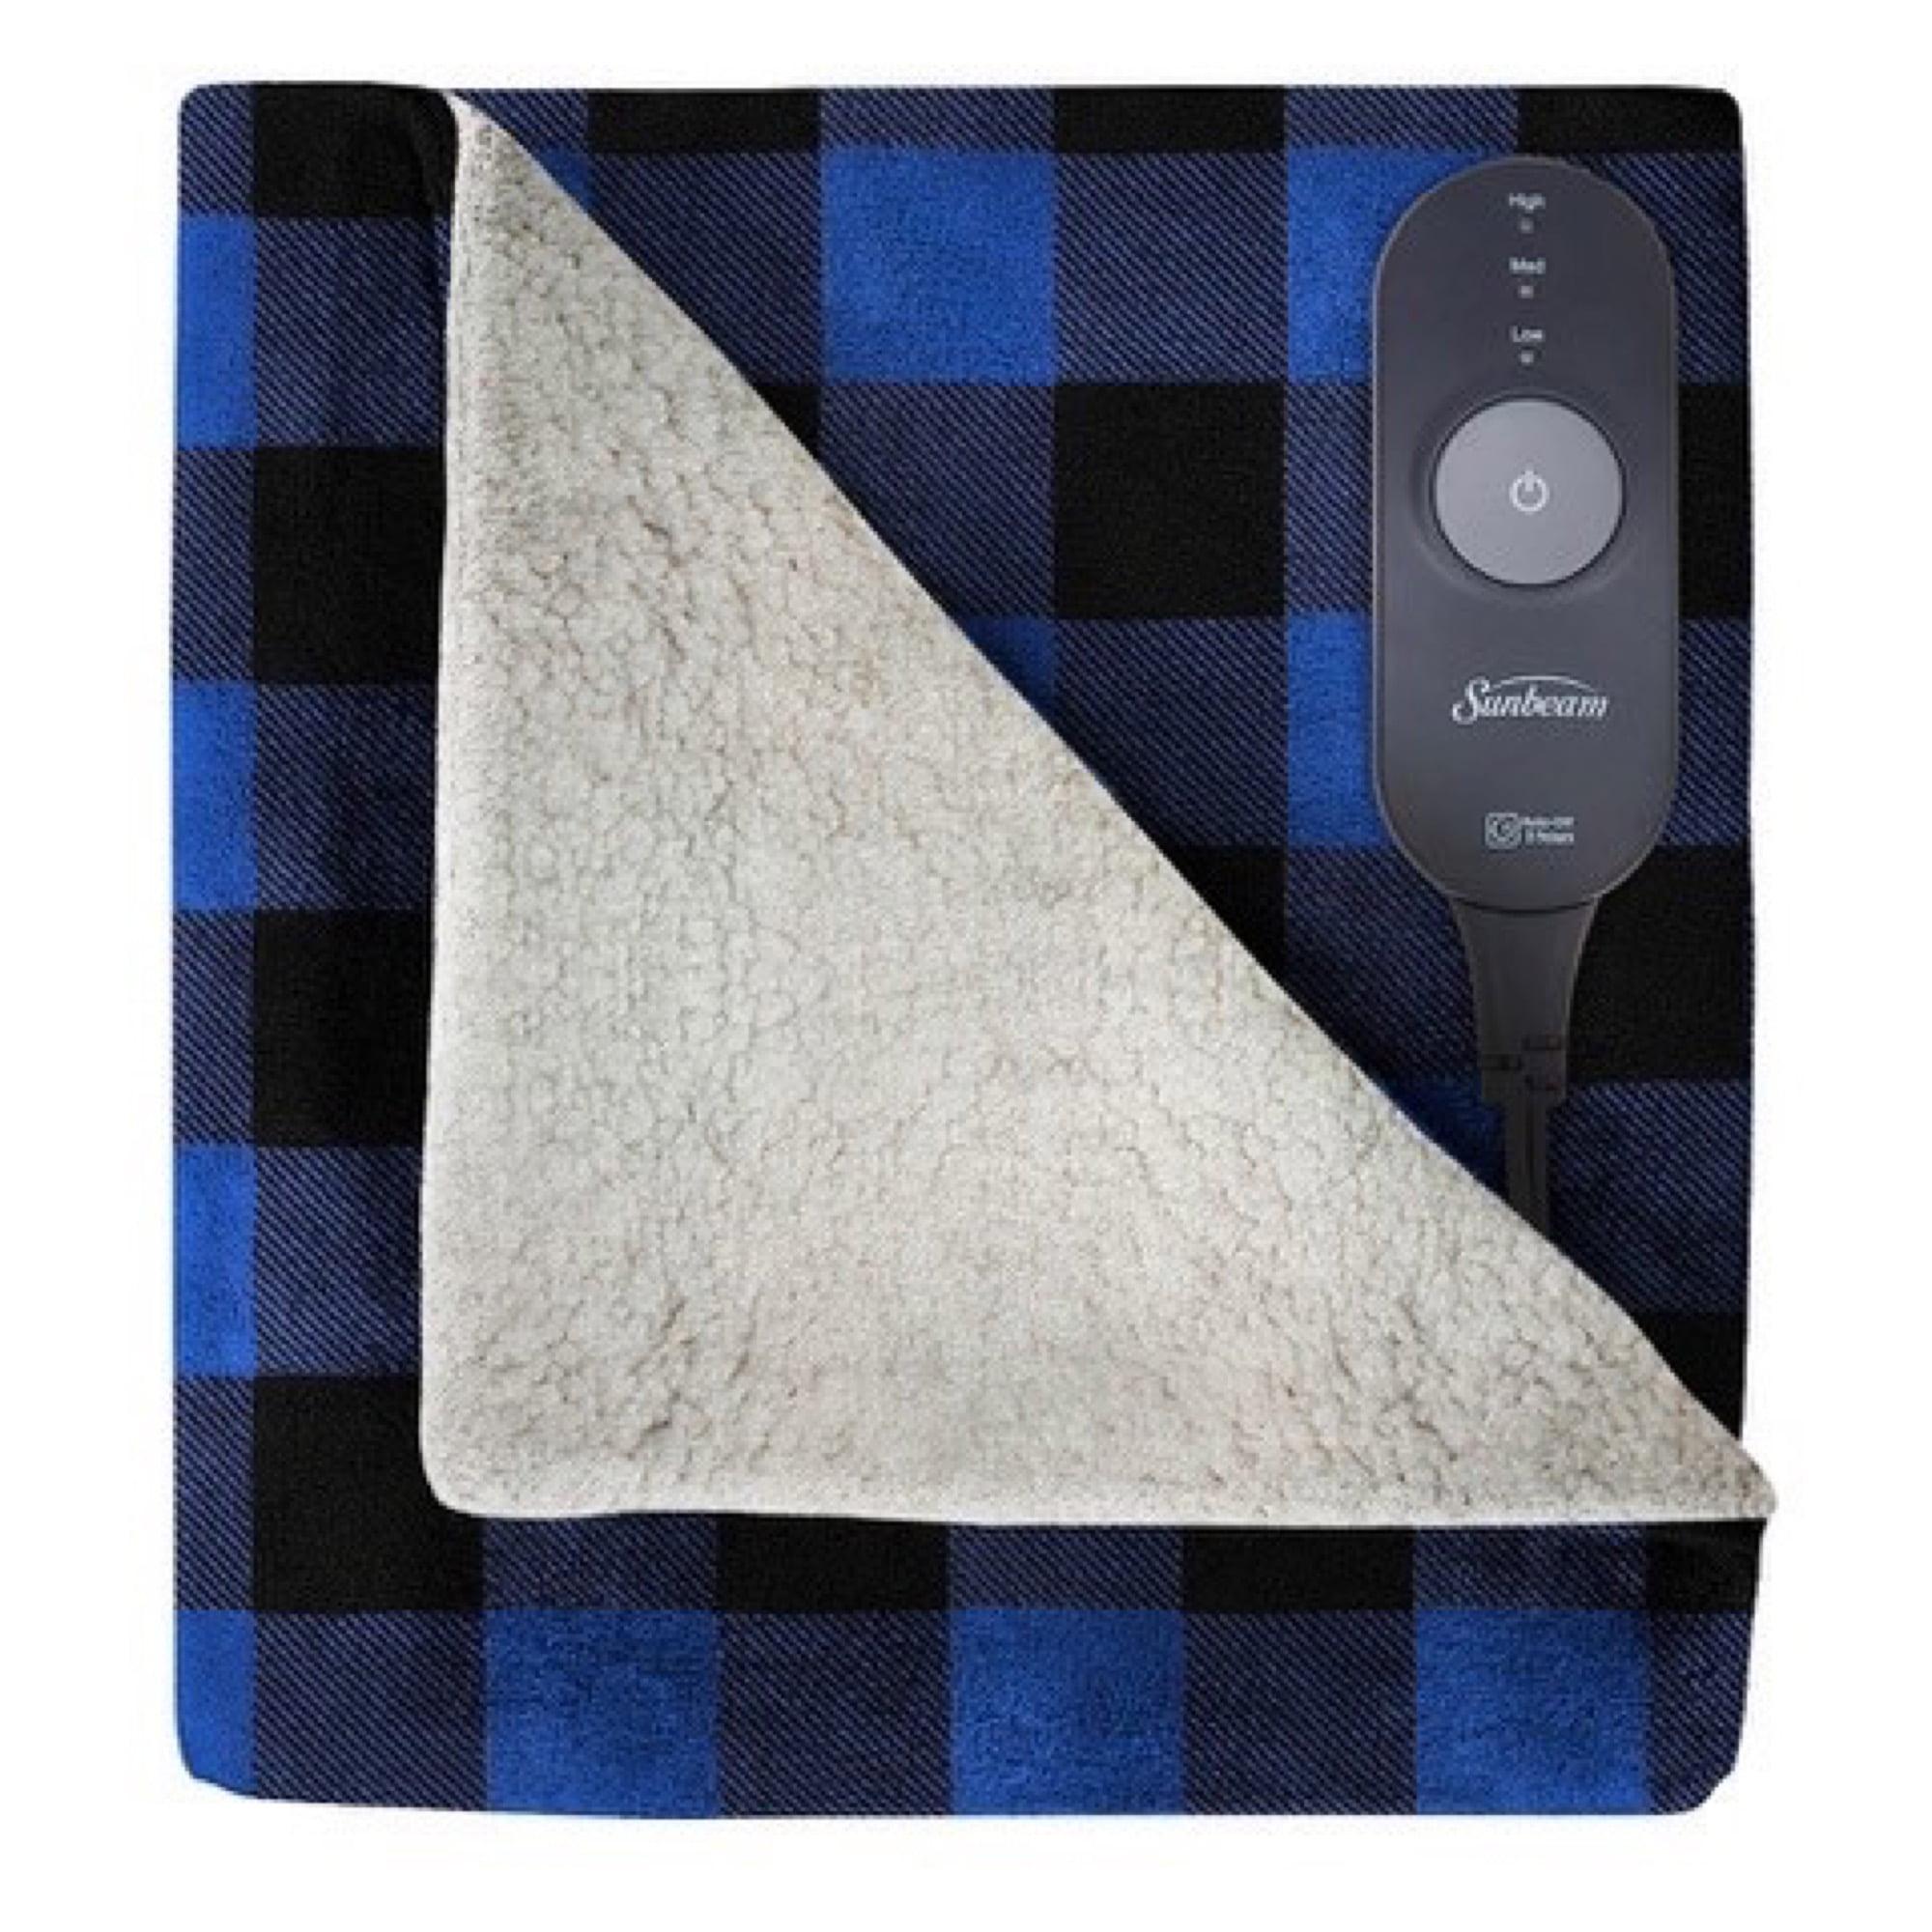 "Sunbeam Heated Electric Microplush Sherpa Throw Blanket, 60"" x 50"", Navy Buffalo Plaid"